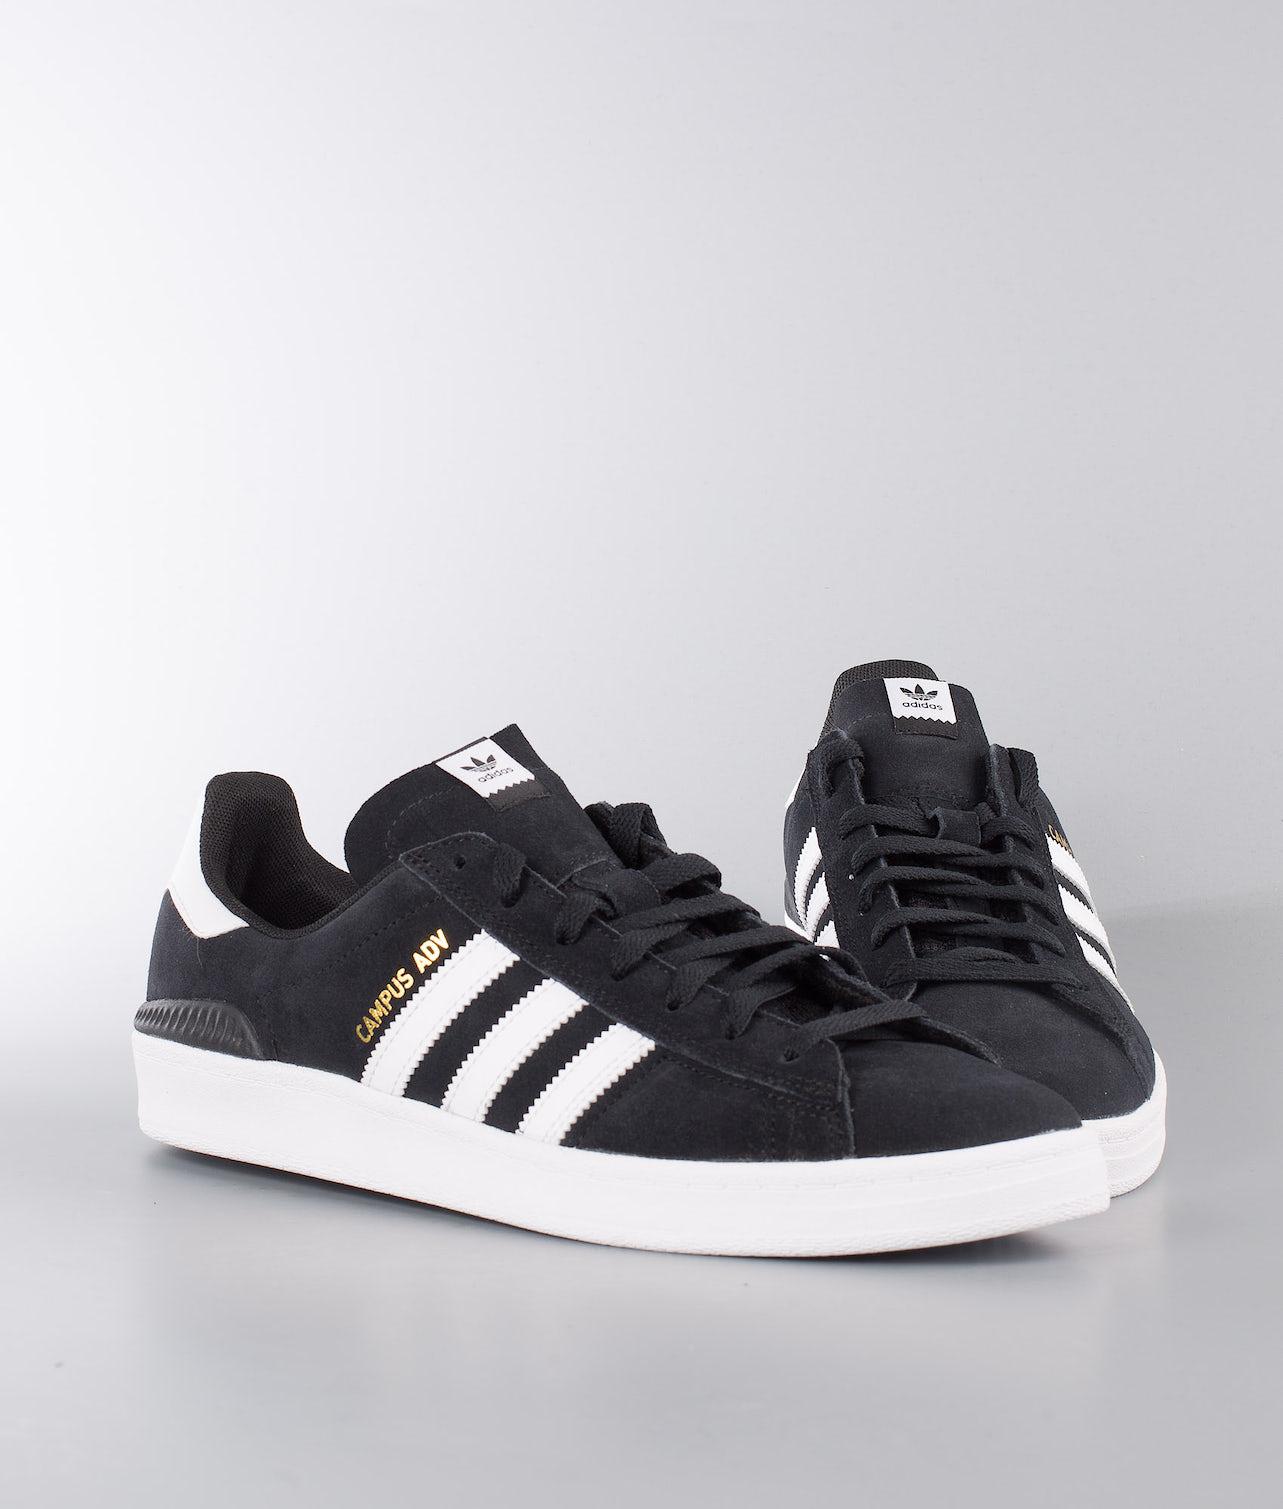 Adidas Skateboarding Campus Adv Sko Core Black/Ftwr White/Ftwr White